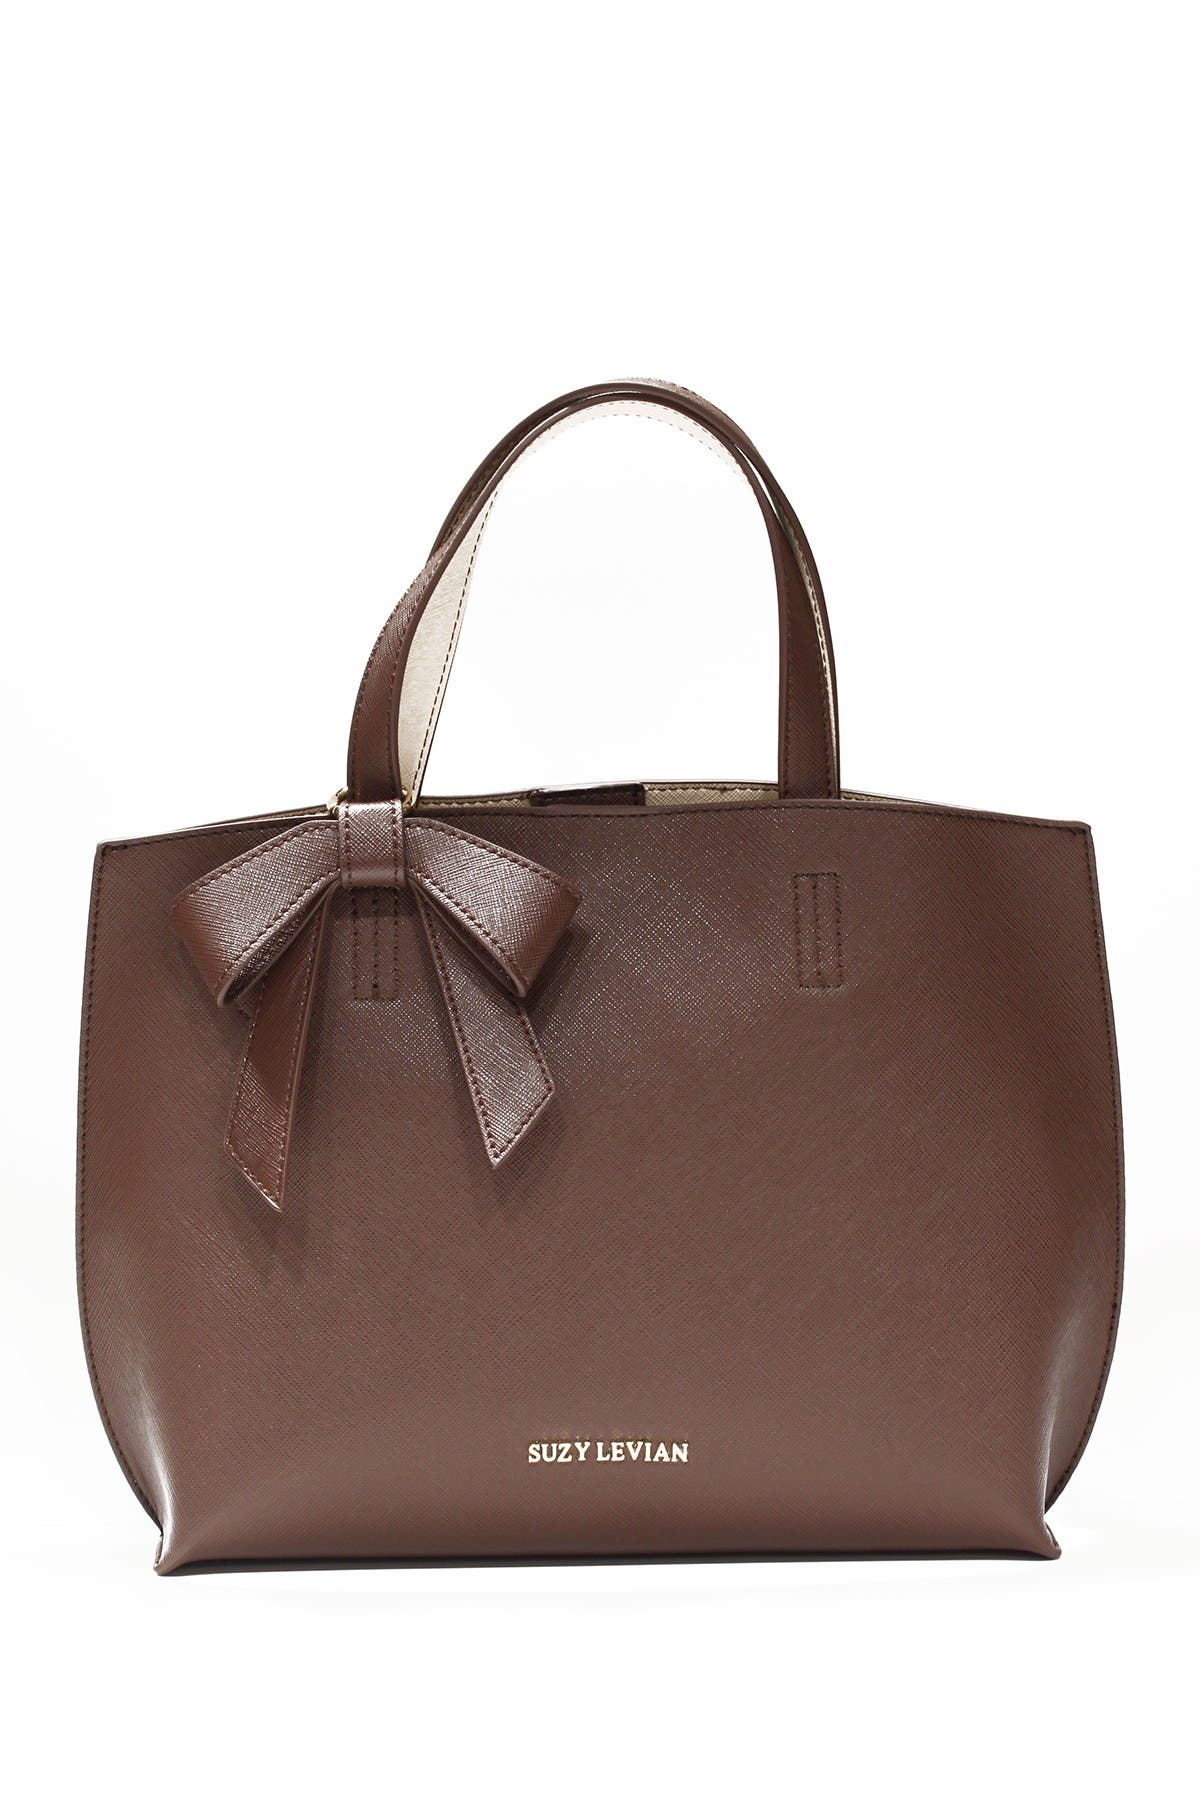 Image of Suzy Levian Saffiano Faux Leather Mini Bow Tote